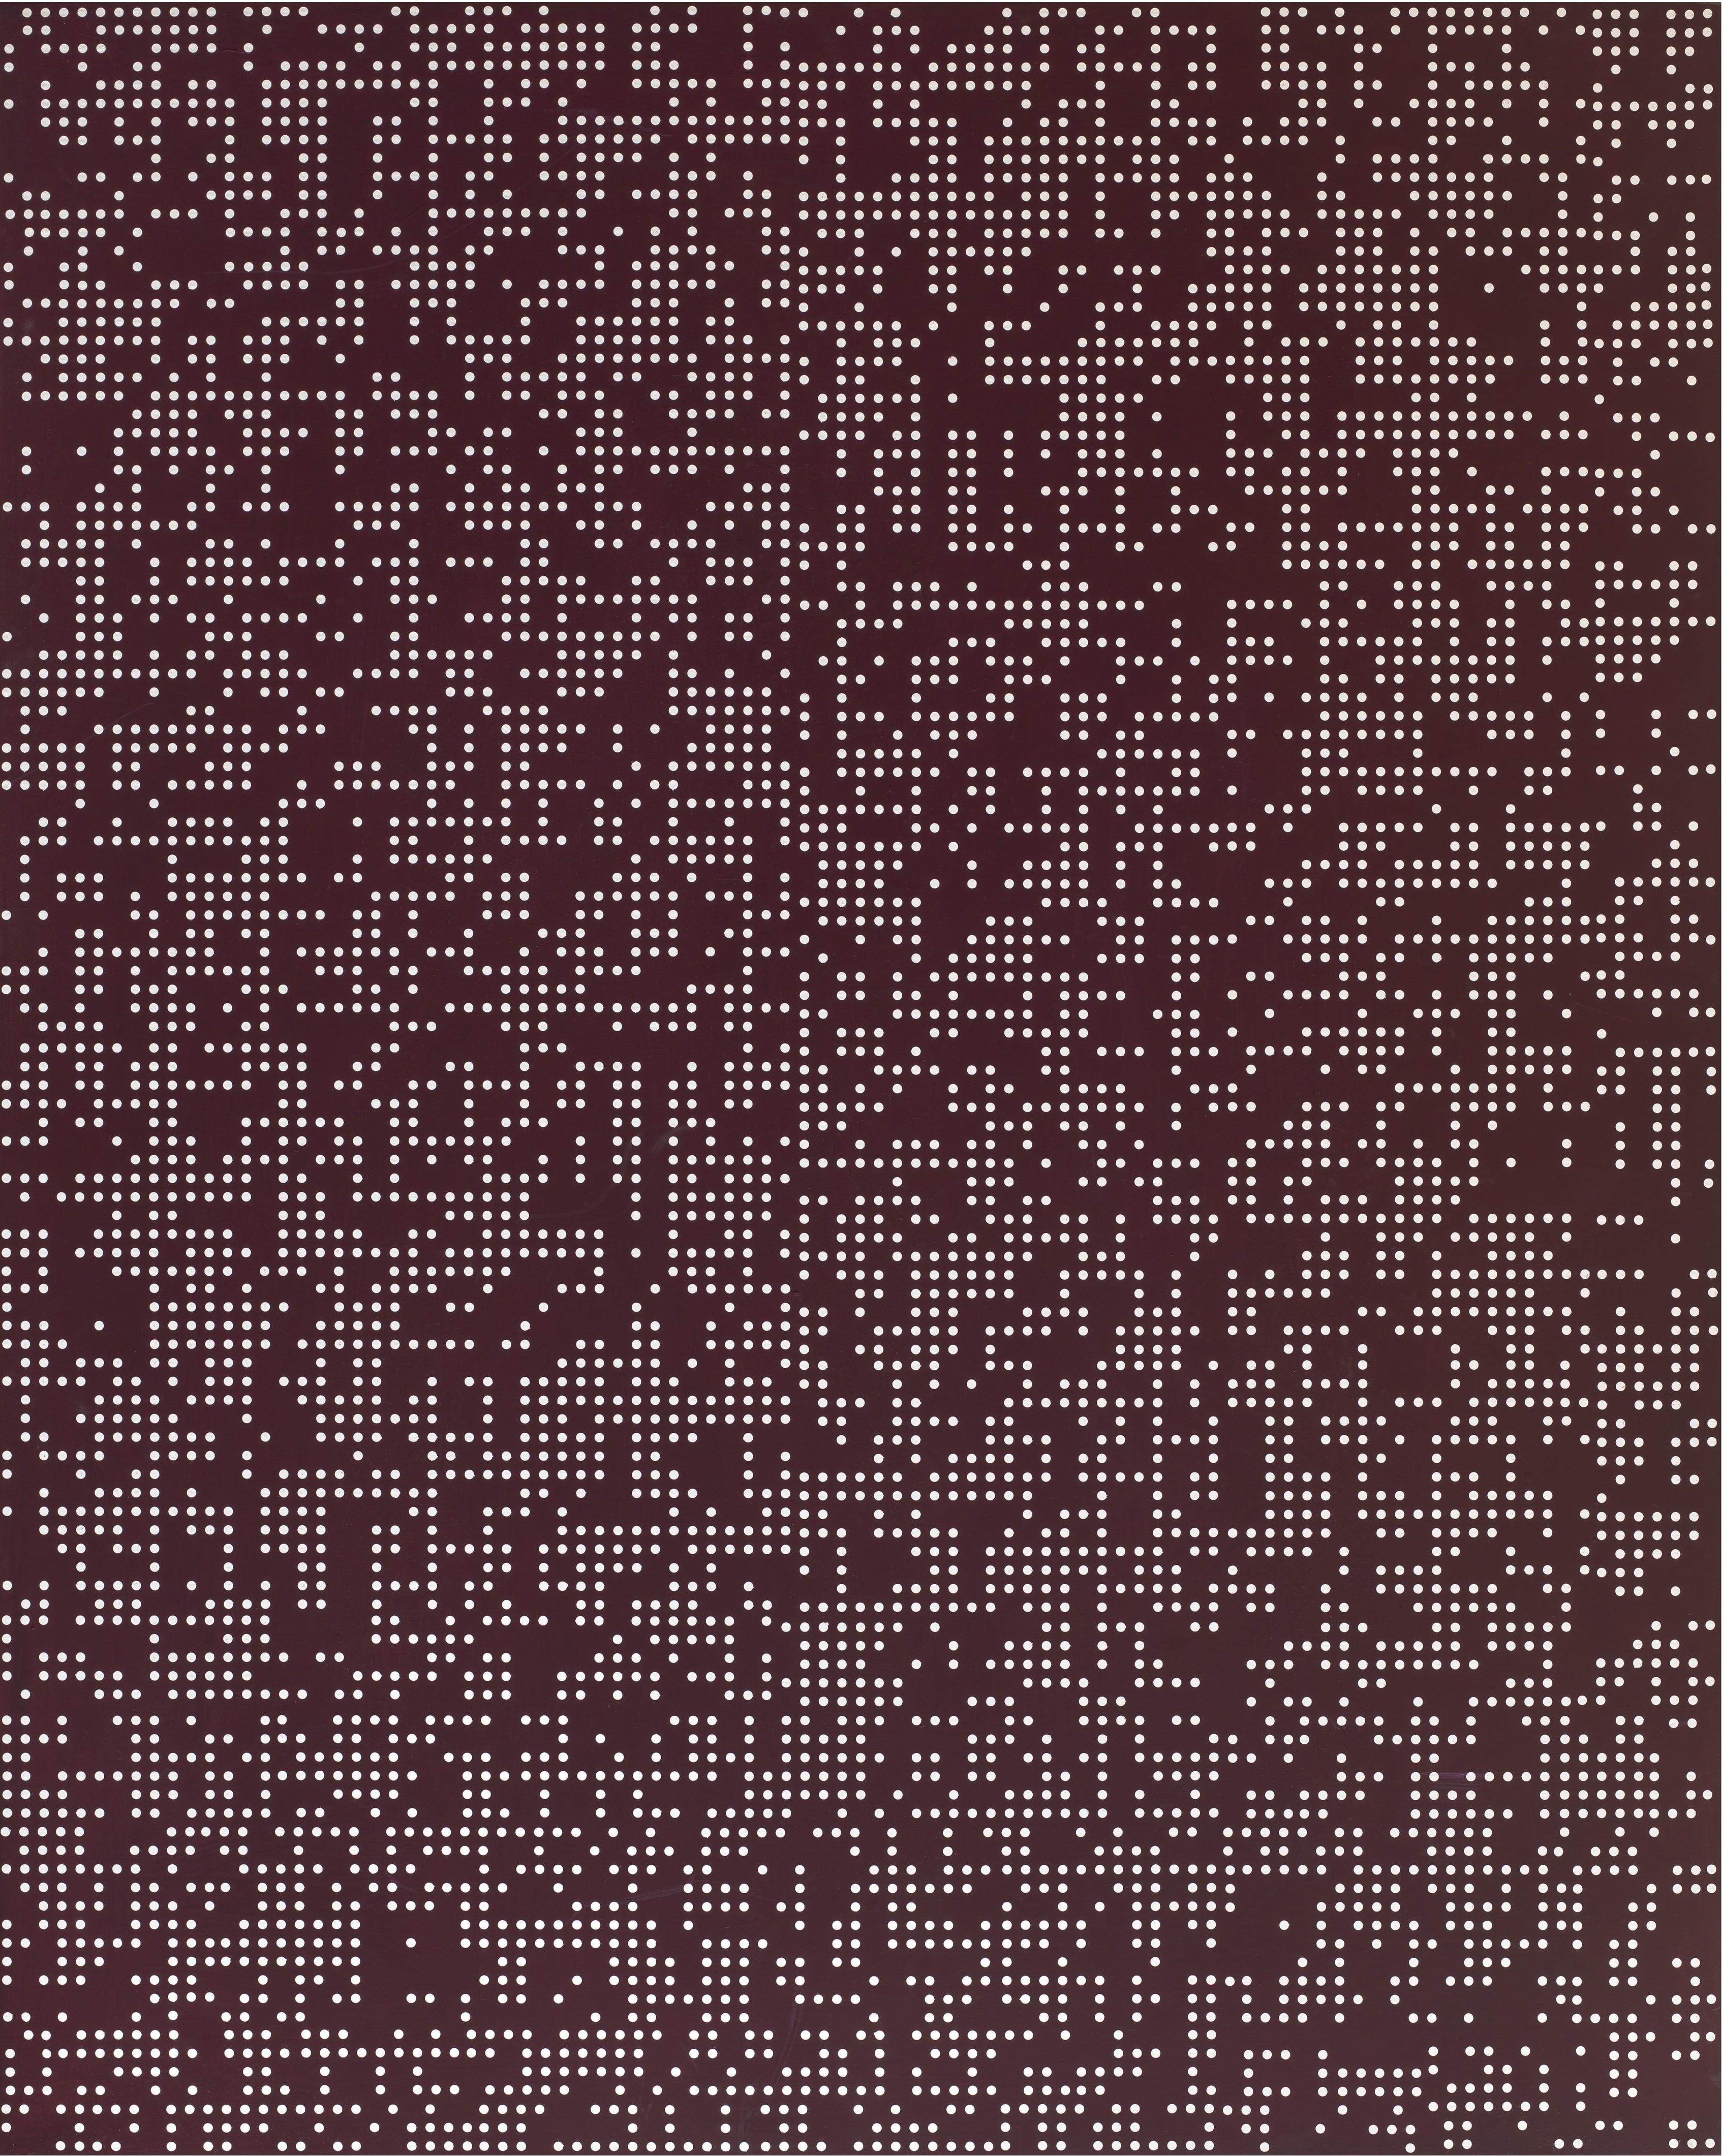 ENCODING 2015 , Acrylic on canvas, 116.8x91cm (2)